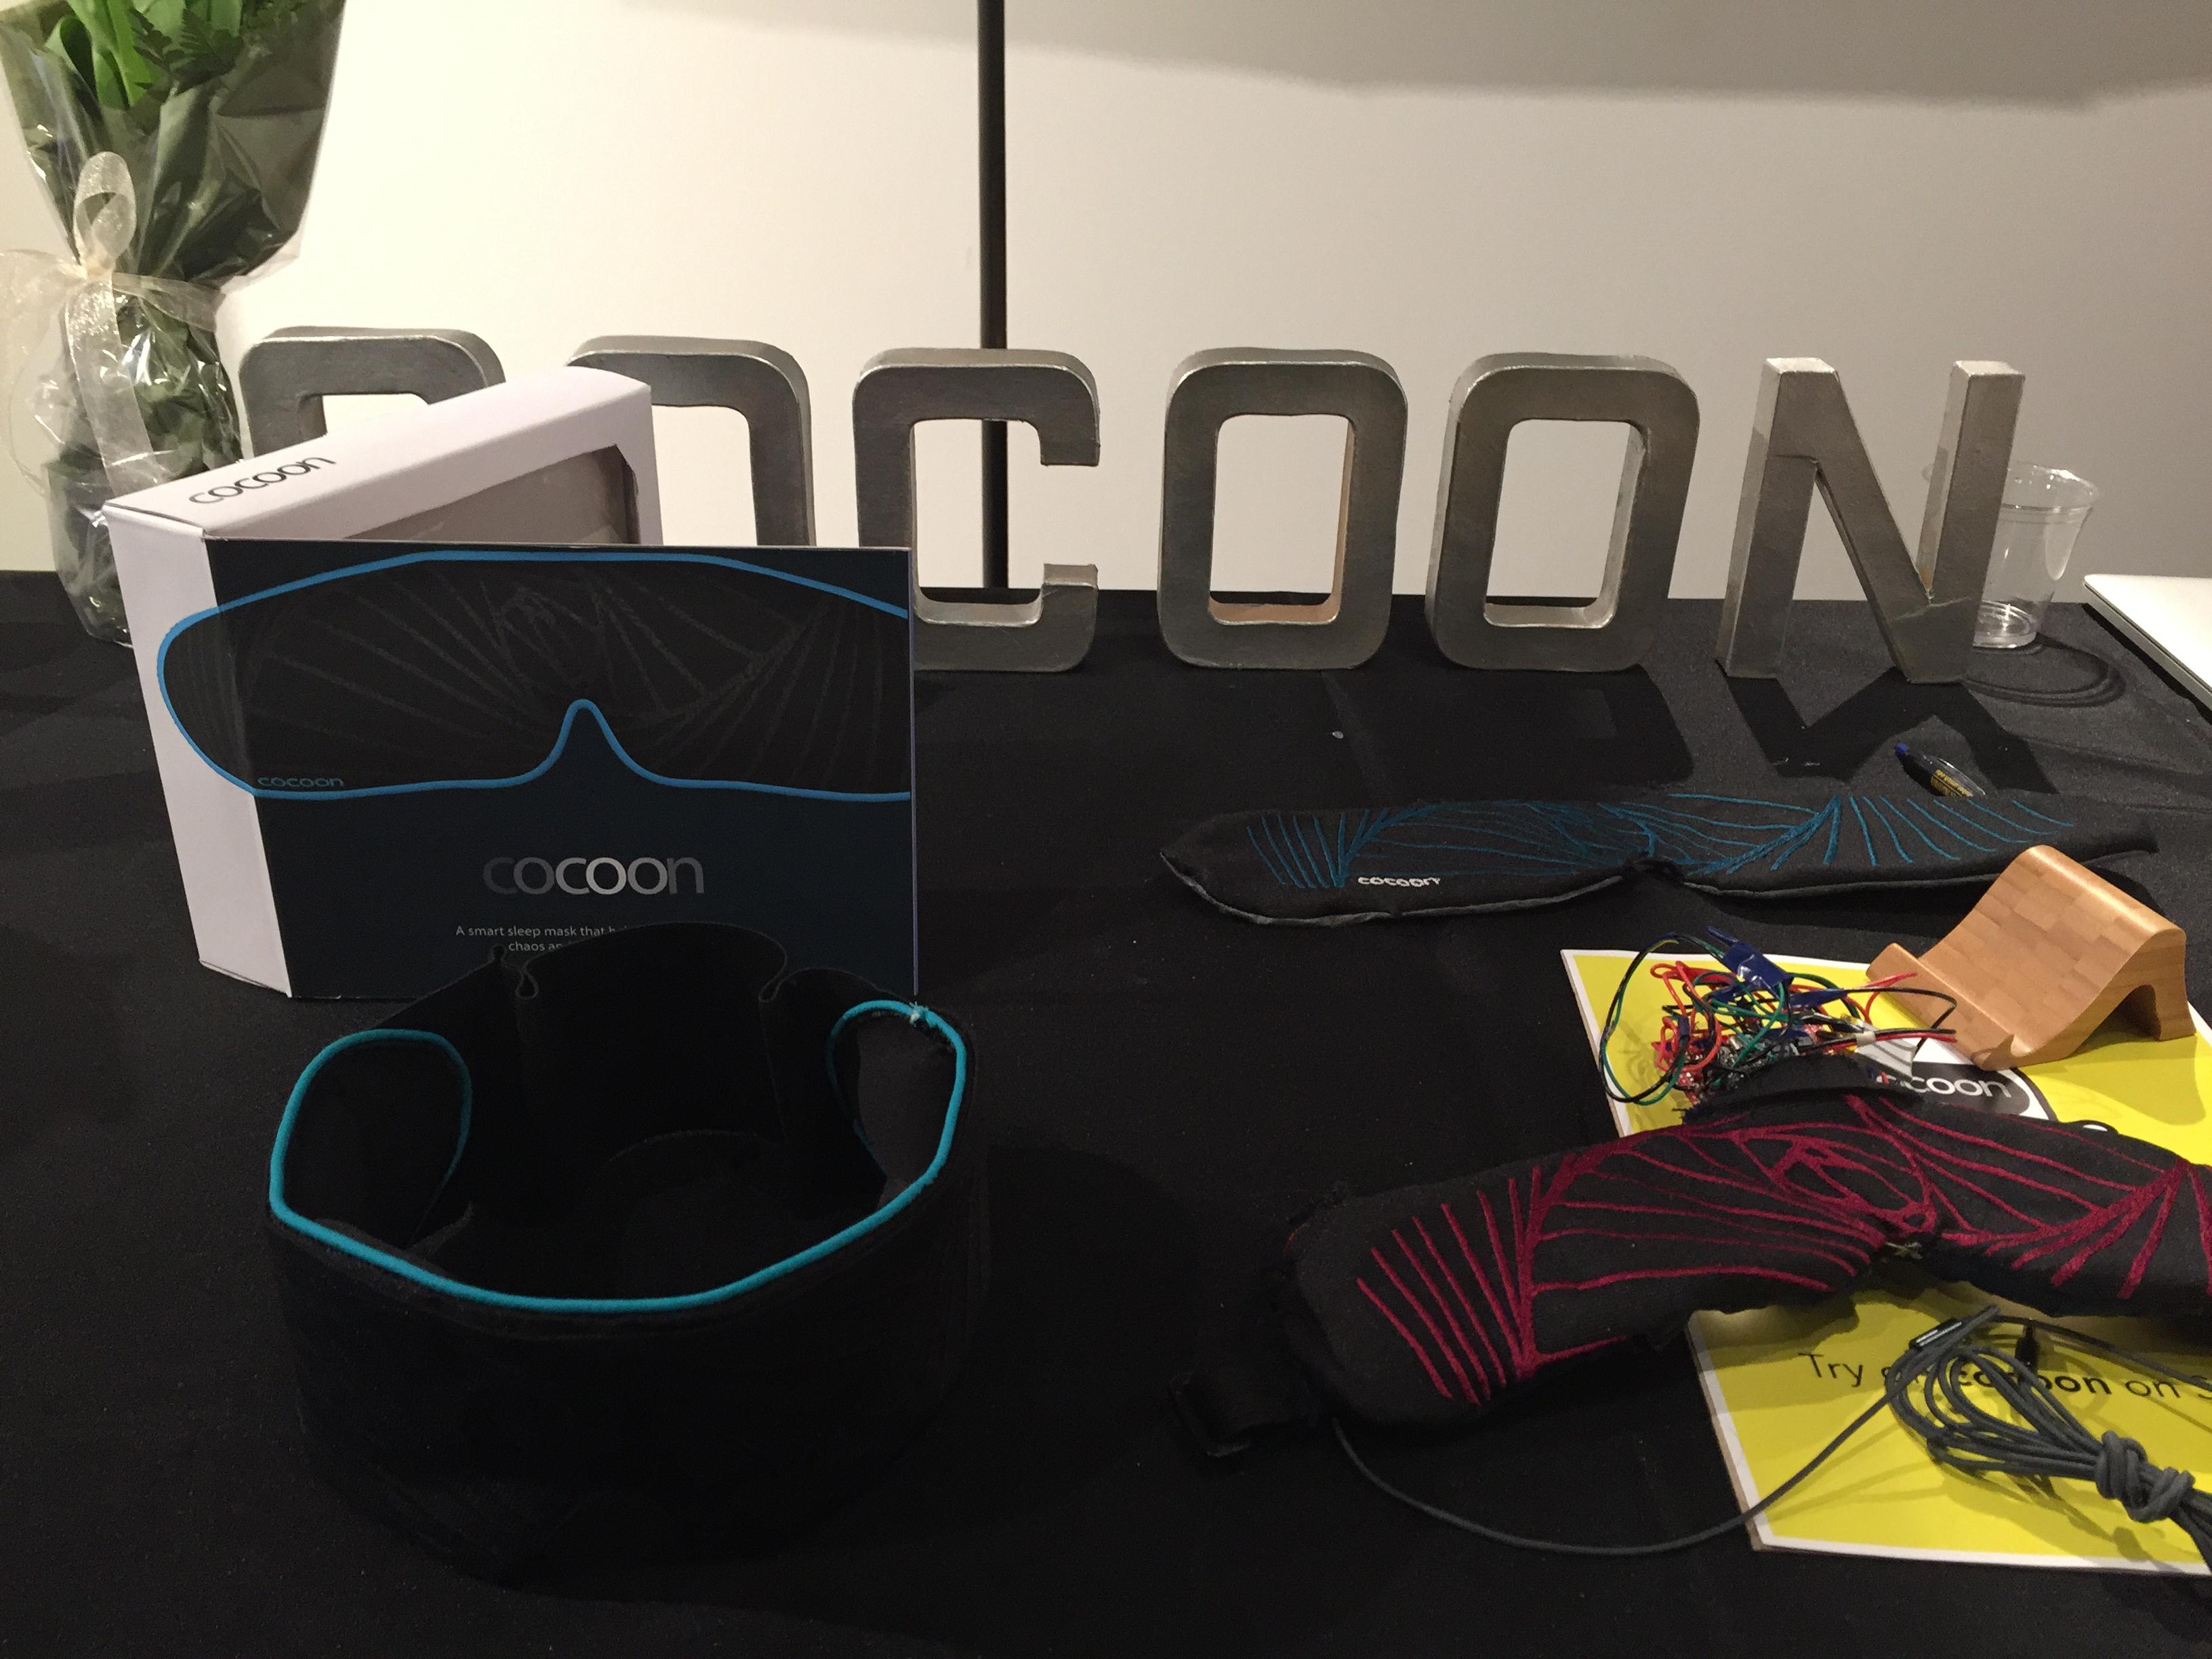 Cocoon: a smart sleep mask